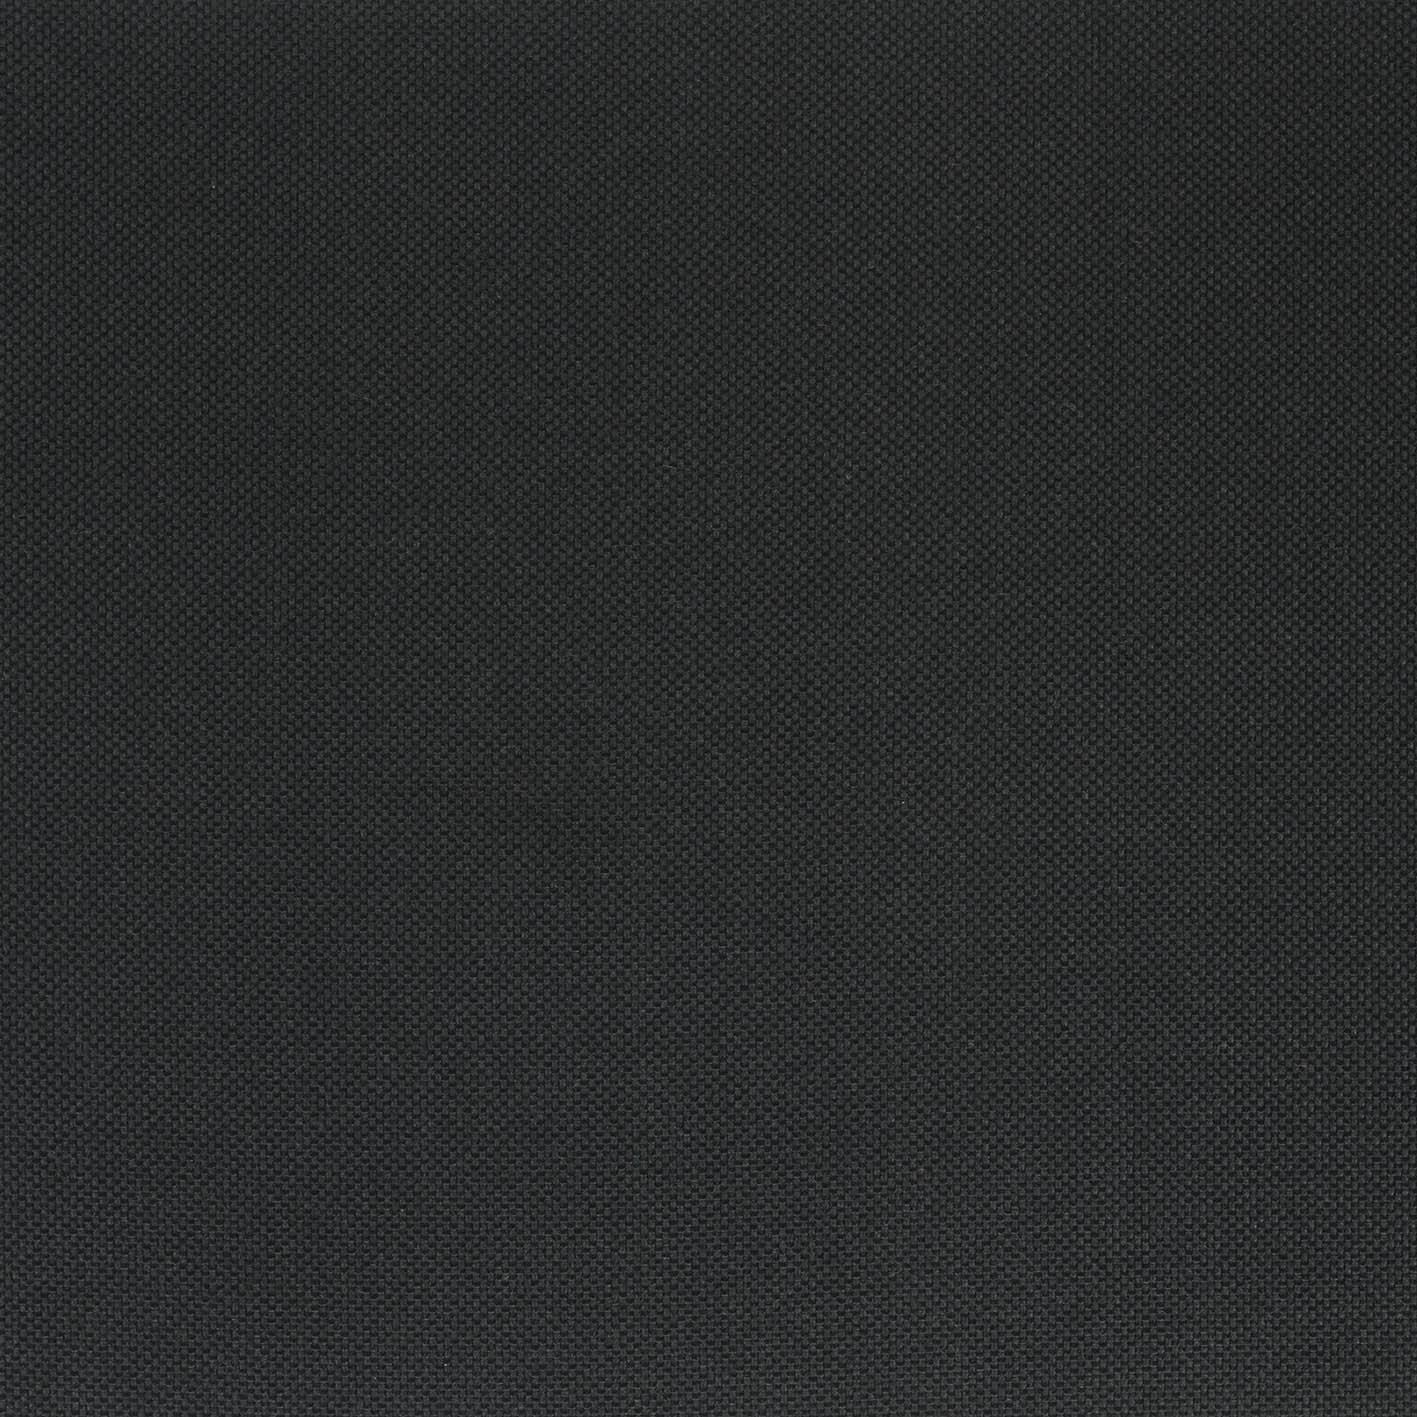 FT1976/03